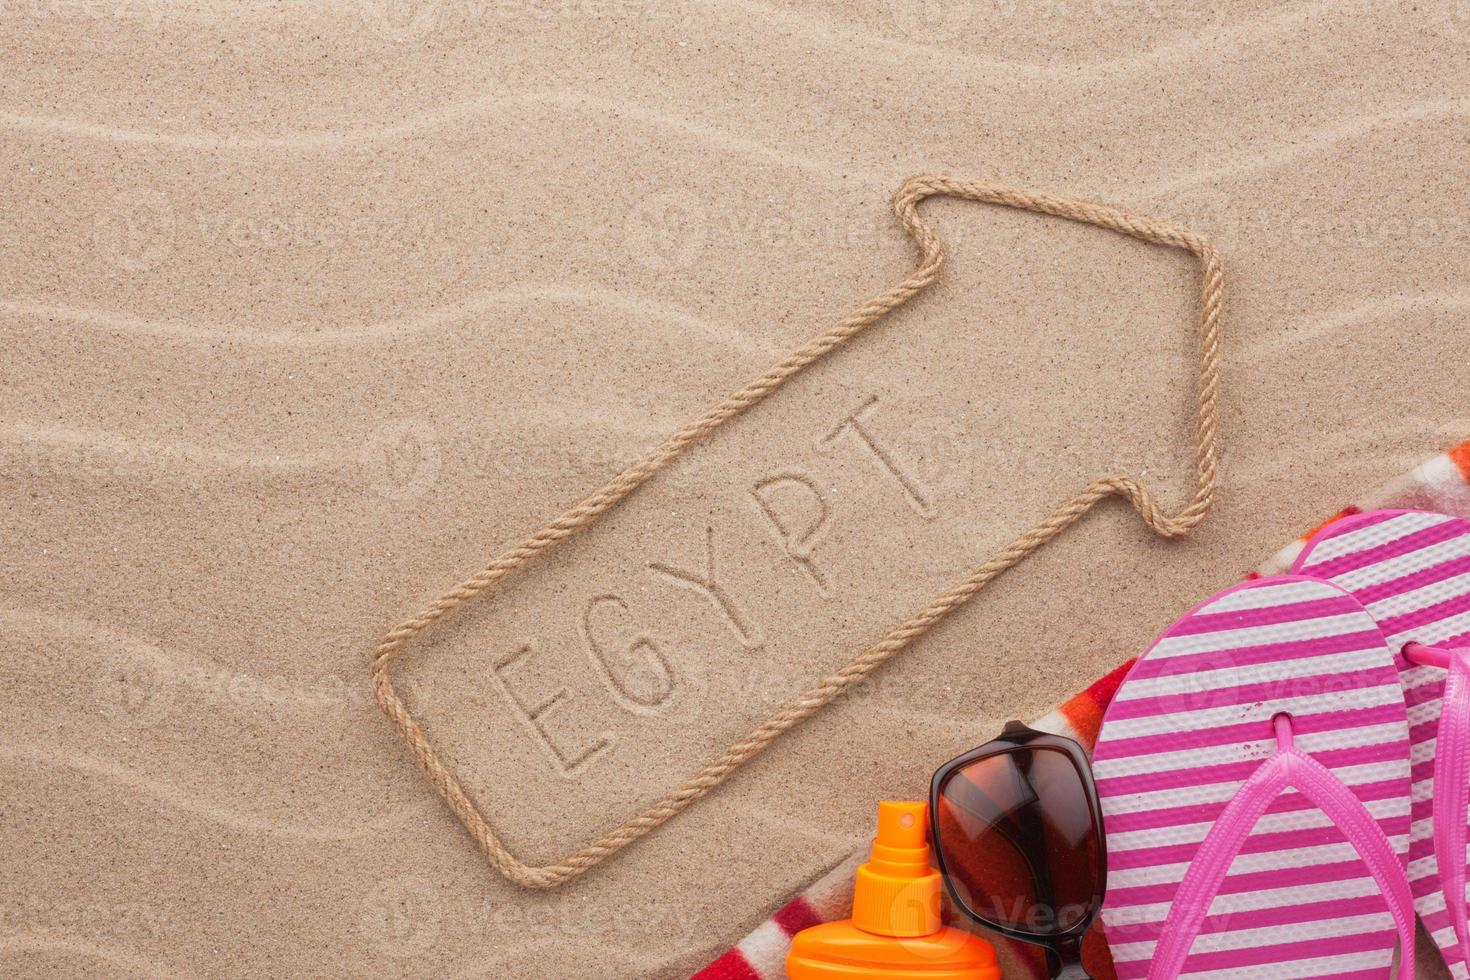 egypte aanwijzer en strandaccessoires die op het zand liggen foto